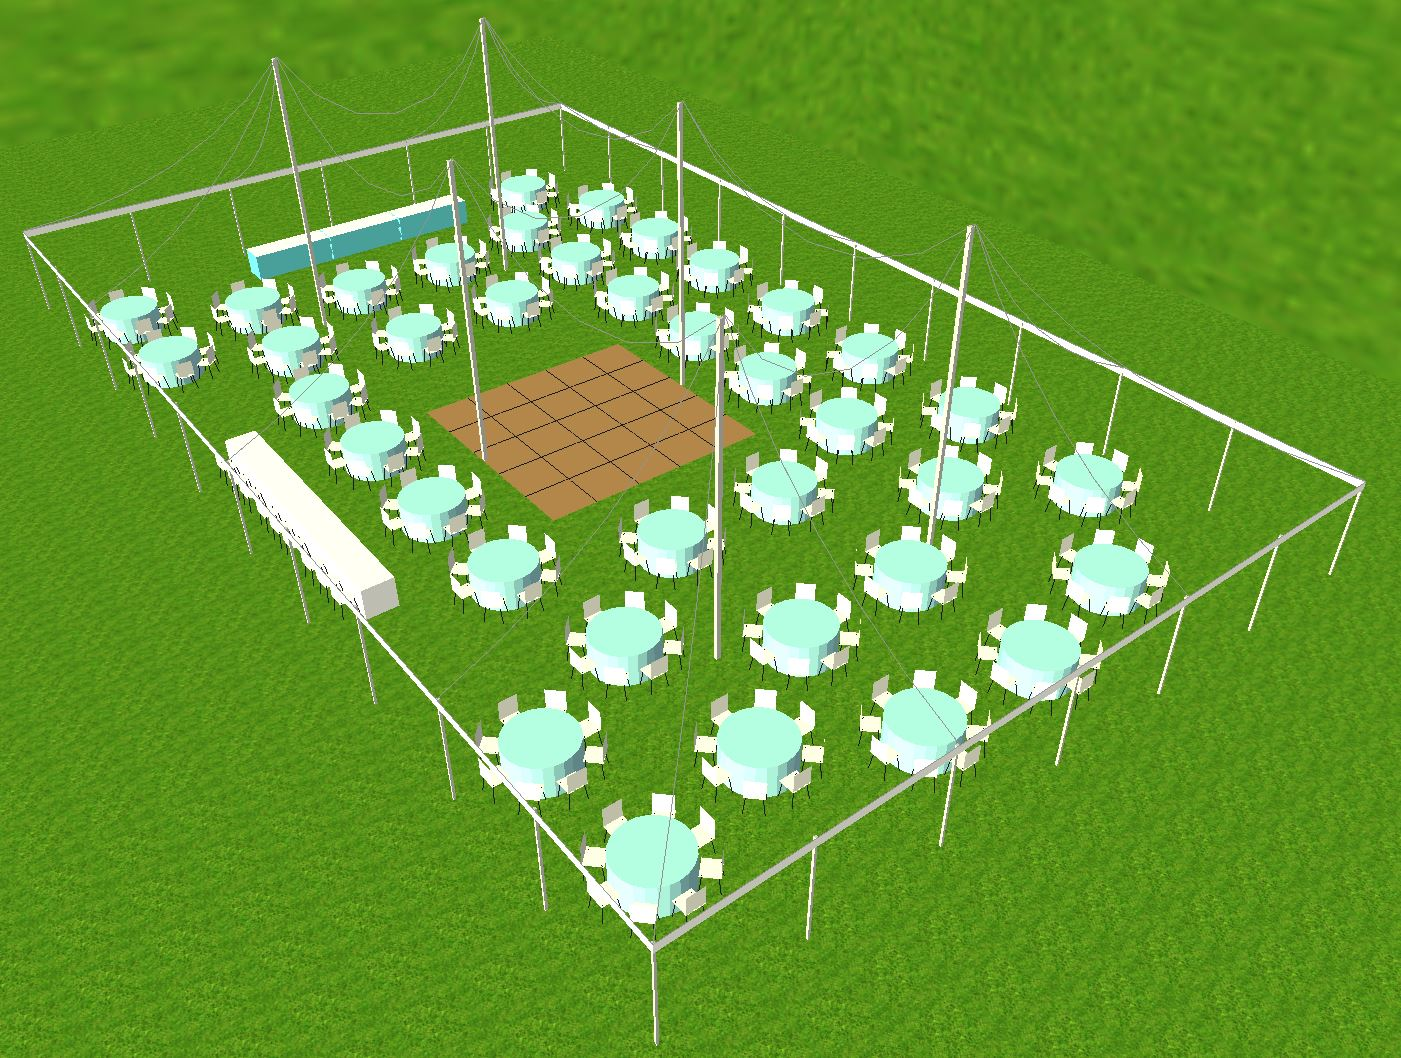 60x100 tent